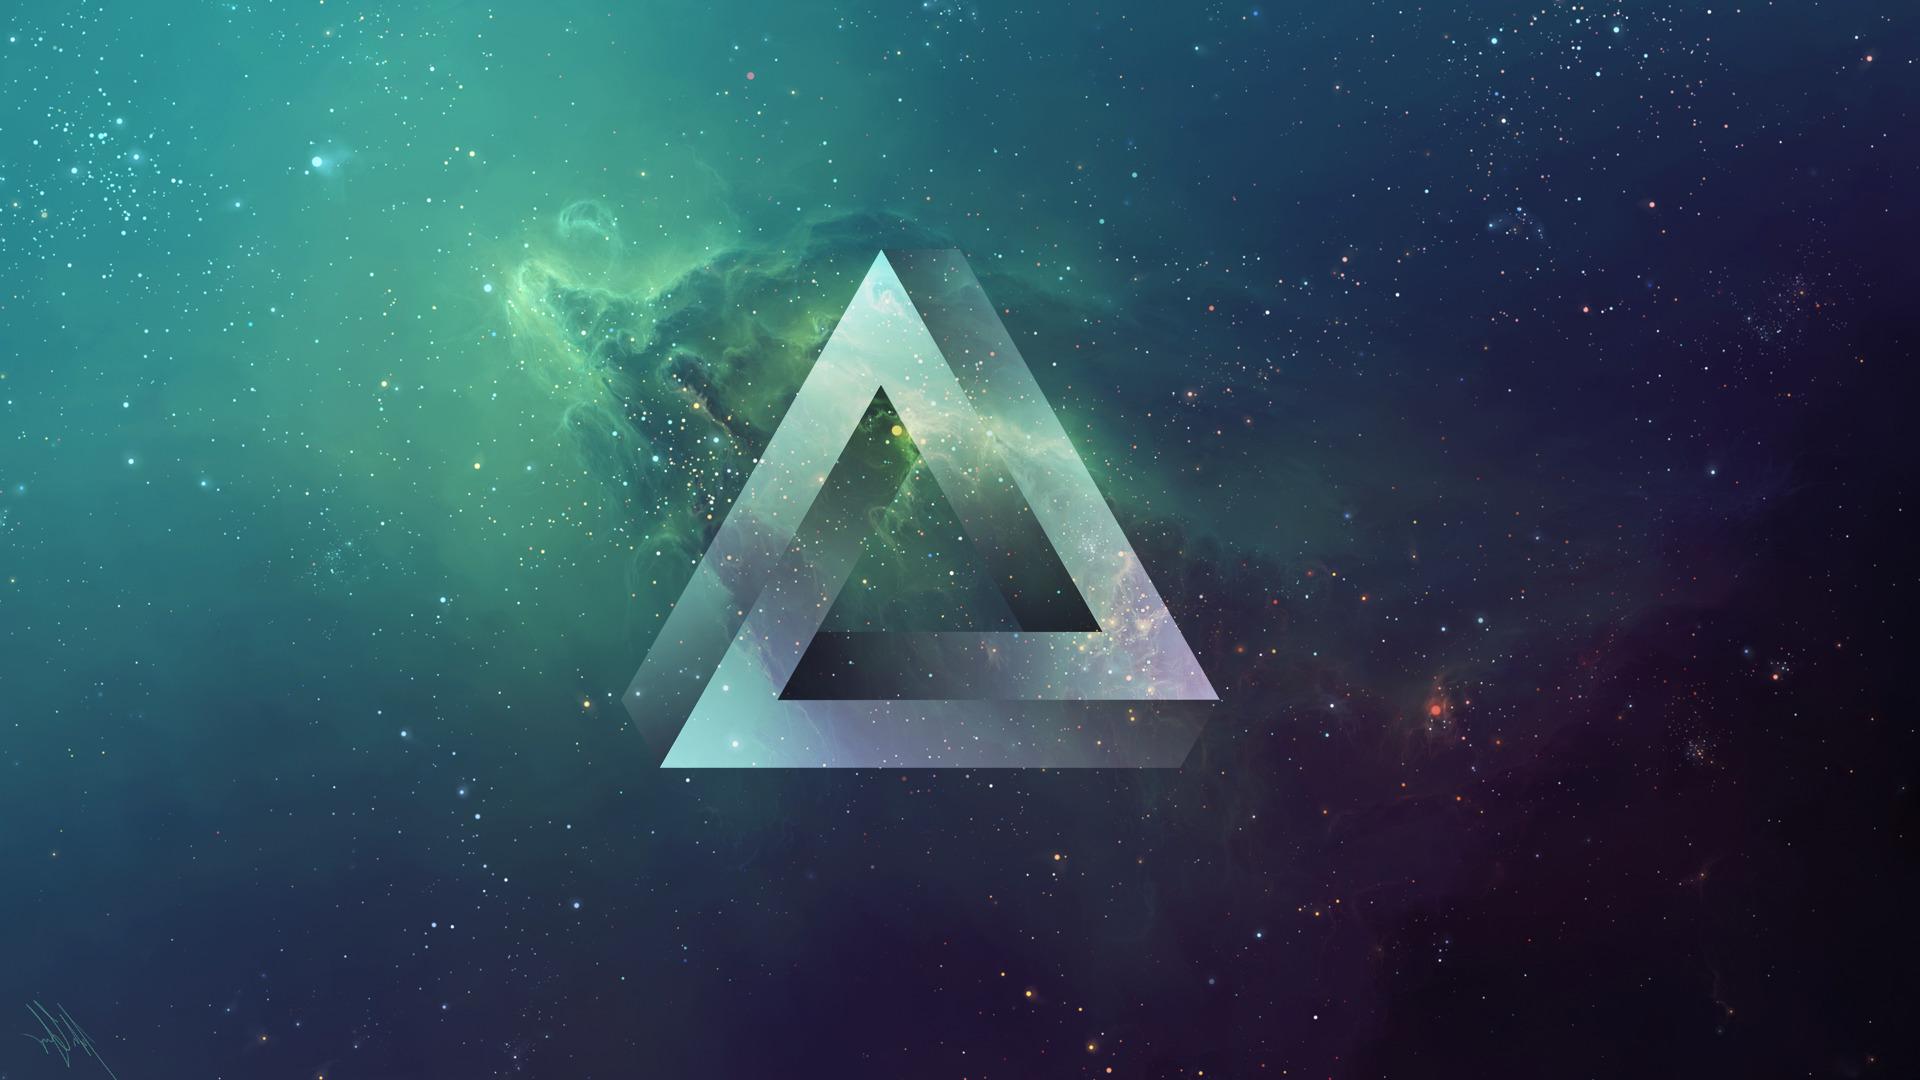 Minimalist Wallpaper Gravity Falls Triangle Space Tylercreatesworlds Penrose Triangle